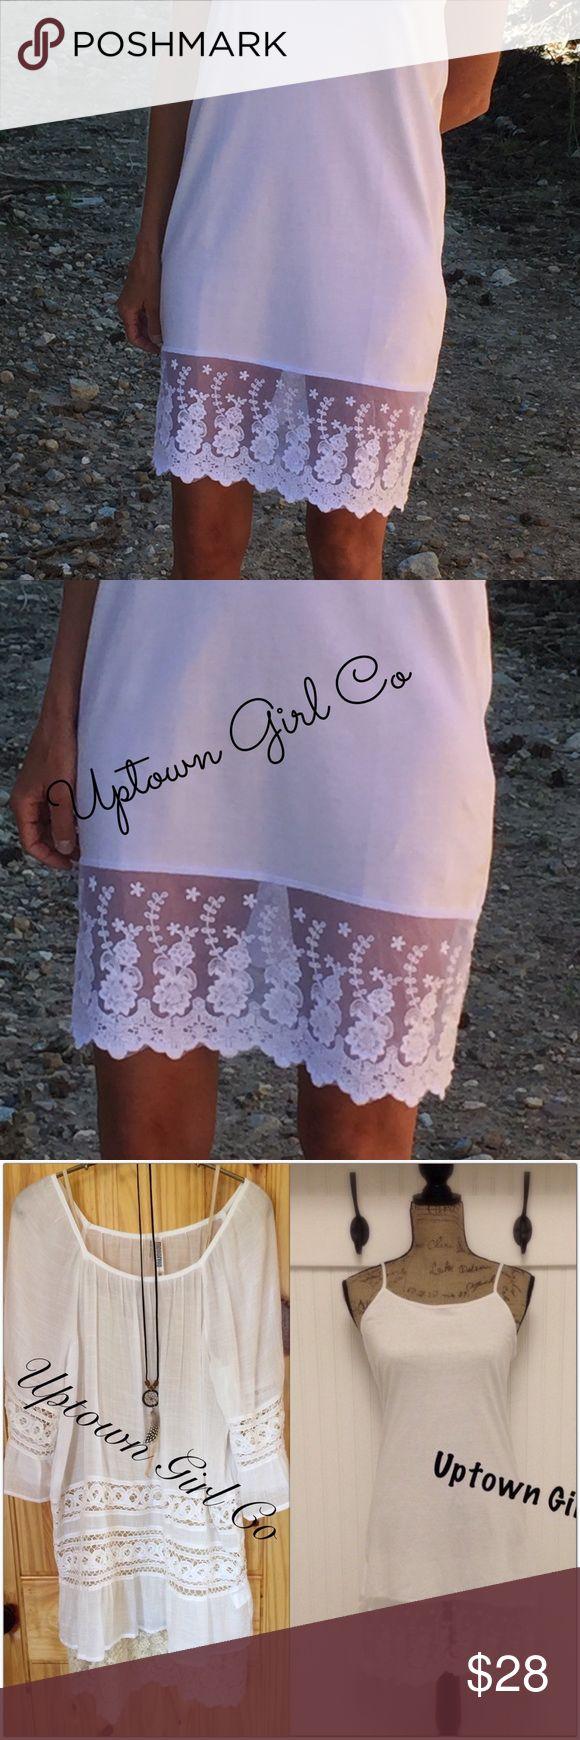 Wholesale lace shirt extender - Dress Extender Lace Extender Shirt Extender Boutique